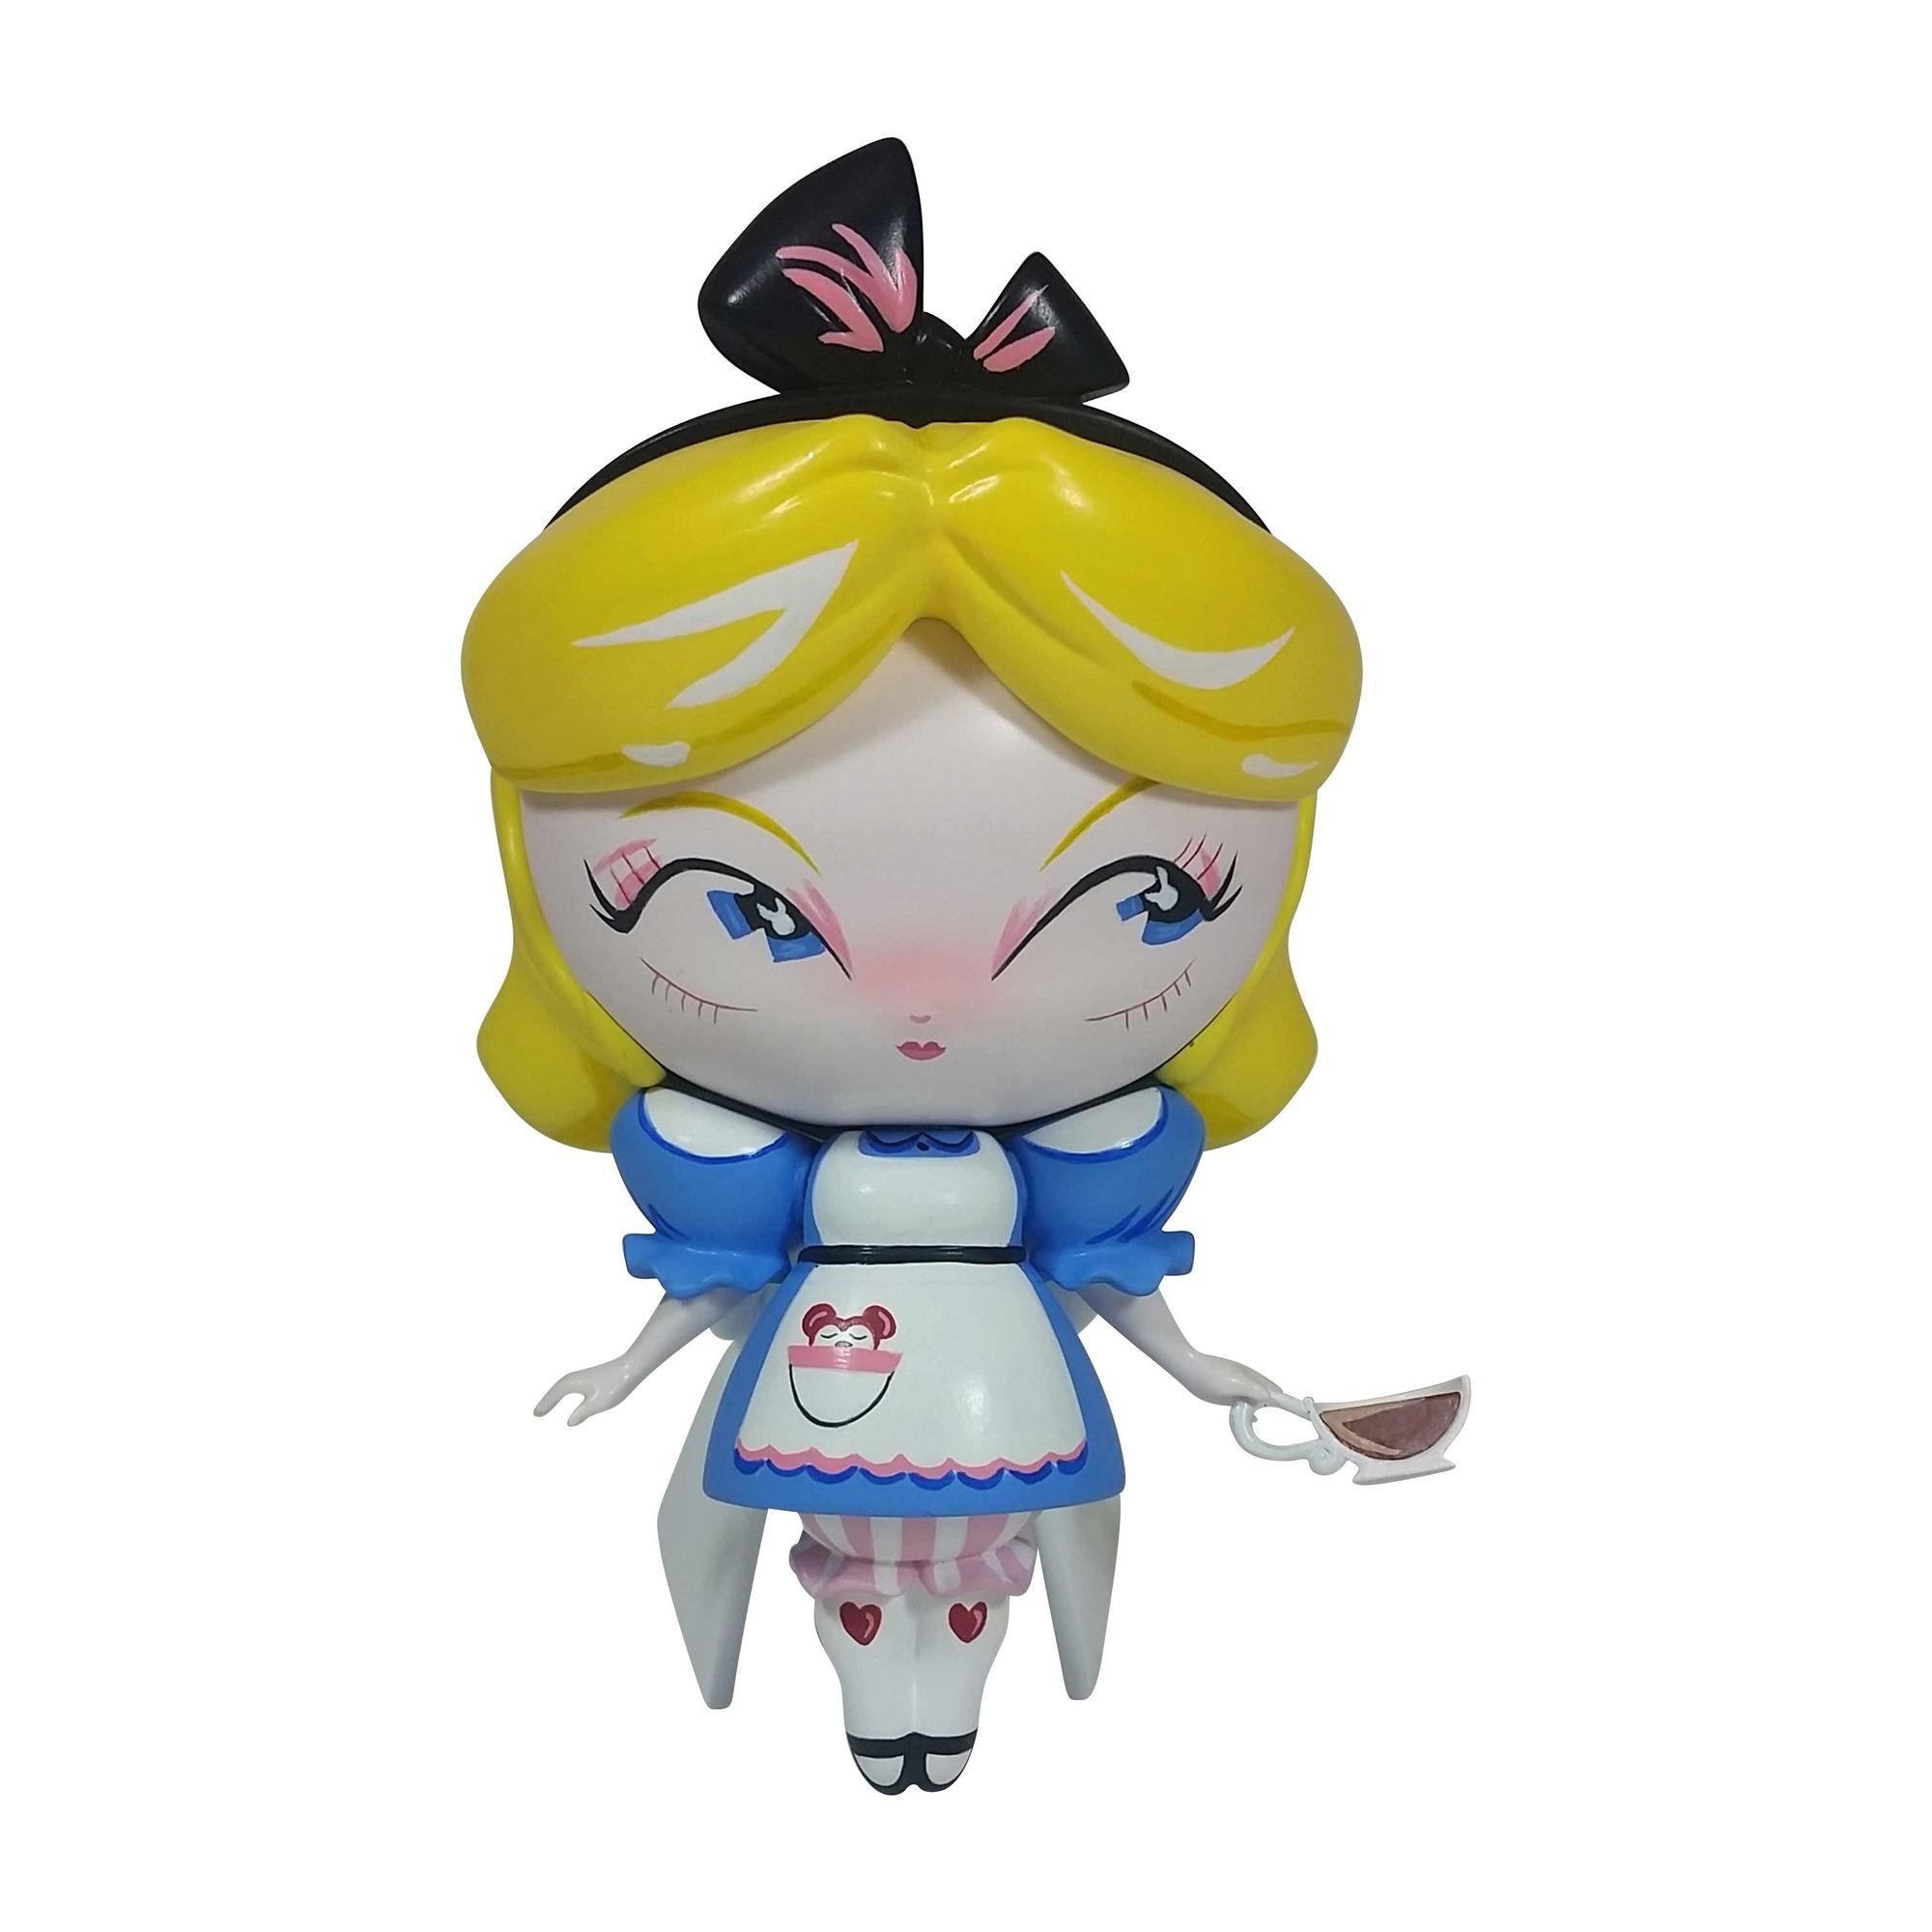 World of Miss Mindy 6001674N Vinyl - Alice